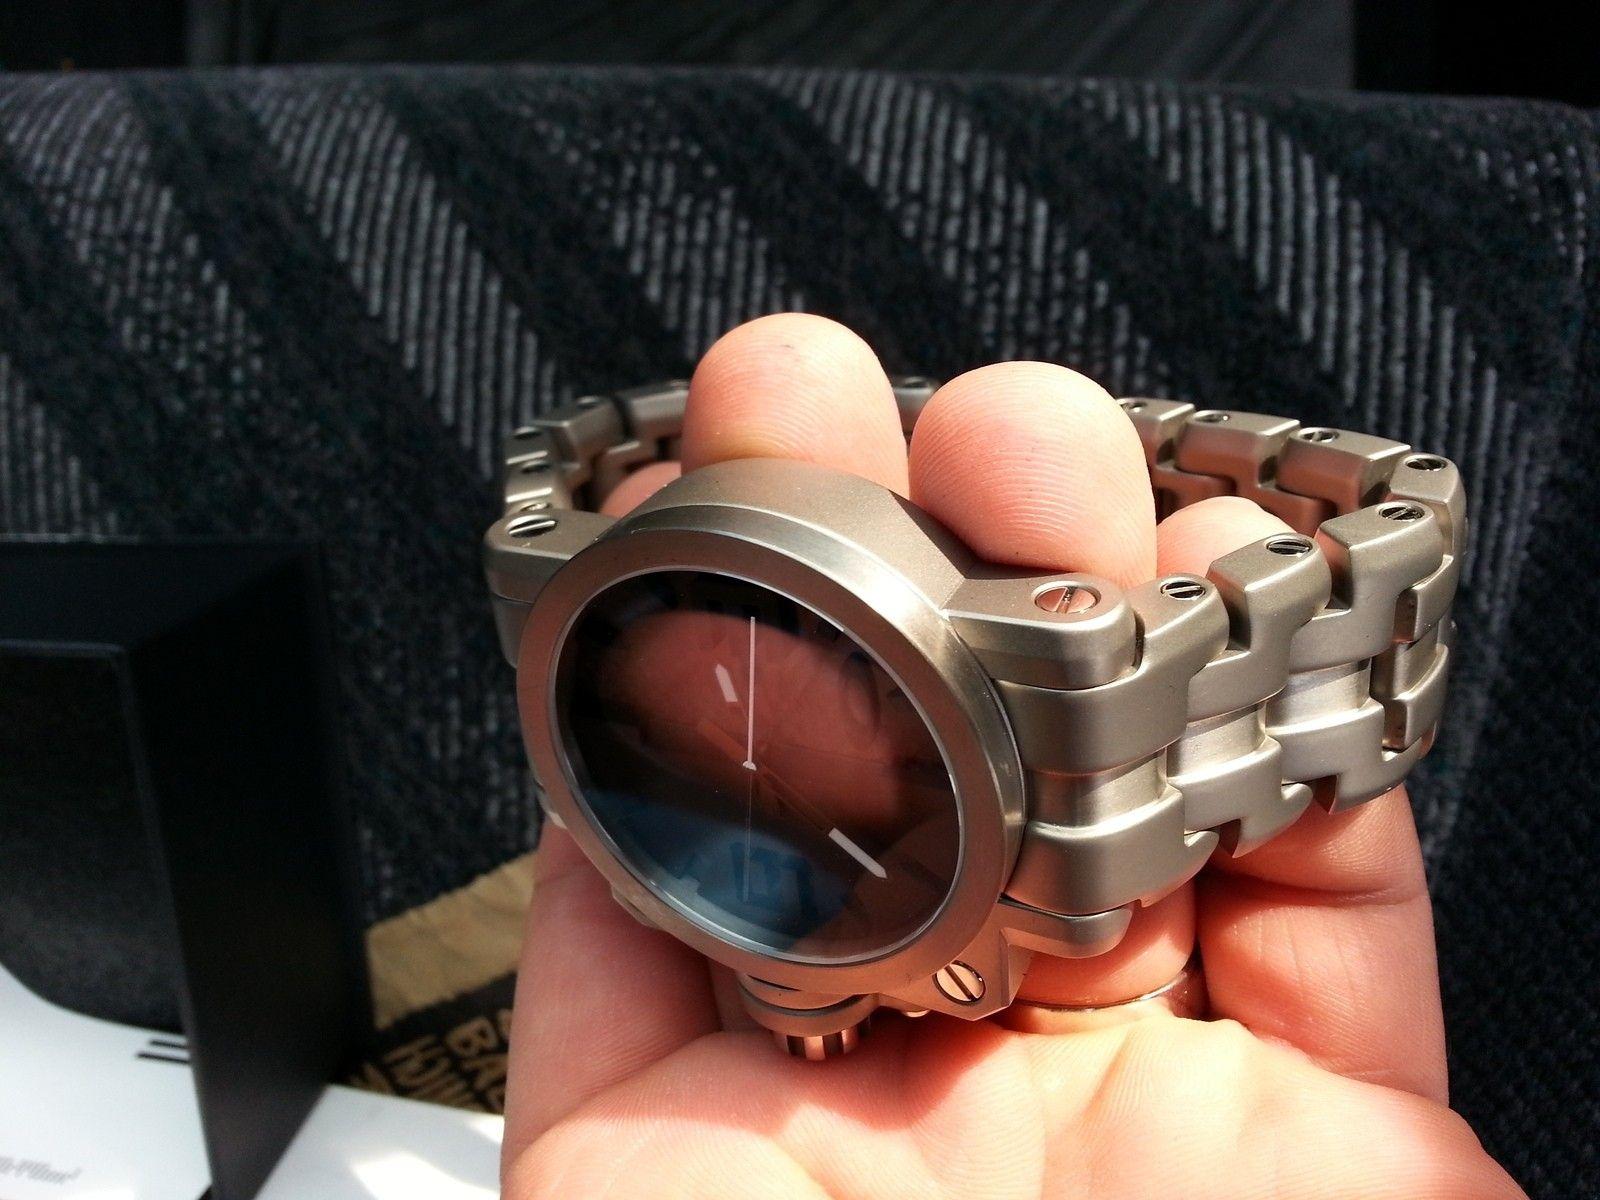 Black Friday Sale: Gearbox Titanium Bracelet - ATT_1448915161313_32268.jpeg